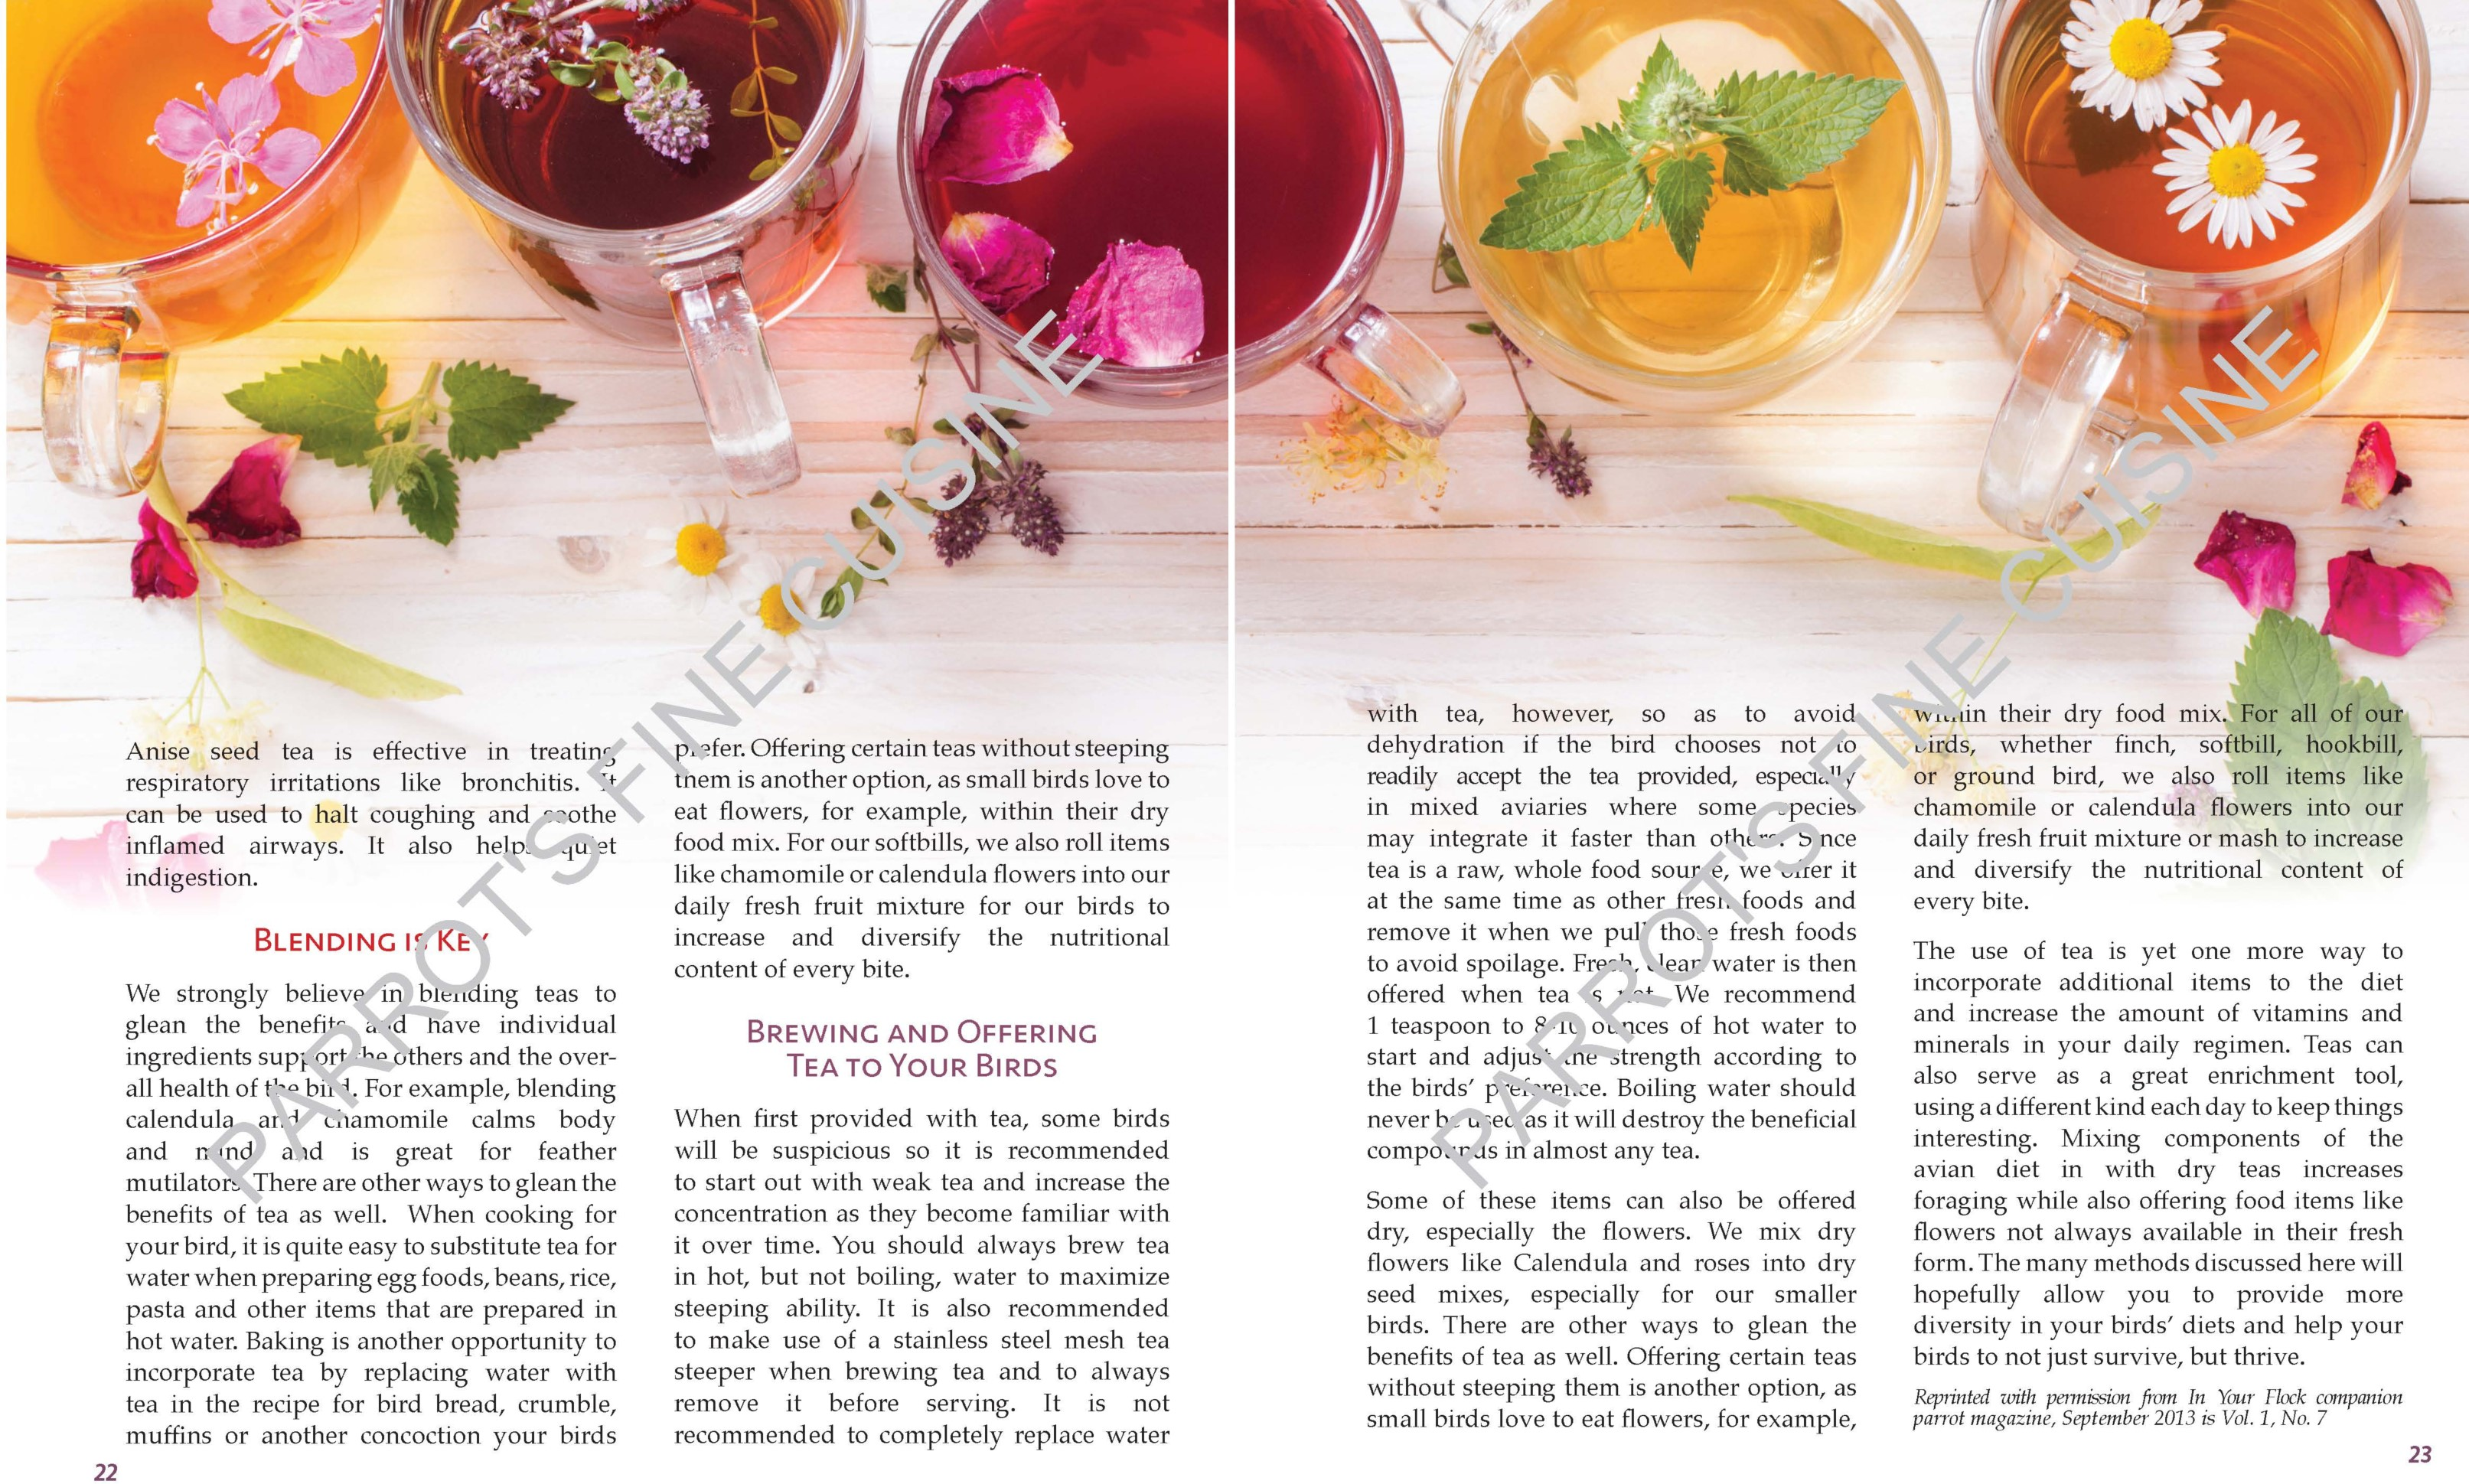 The Use of Tea in Avian Husbandry